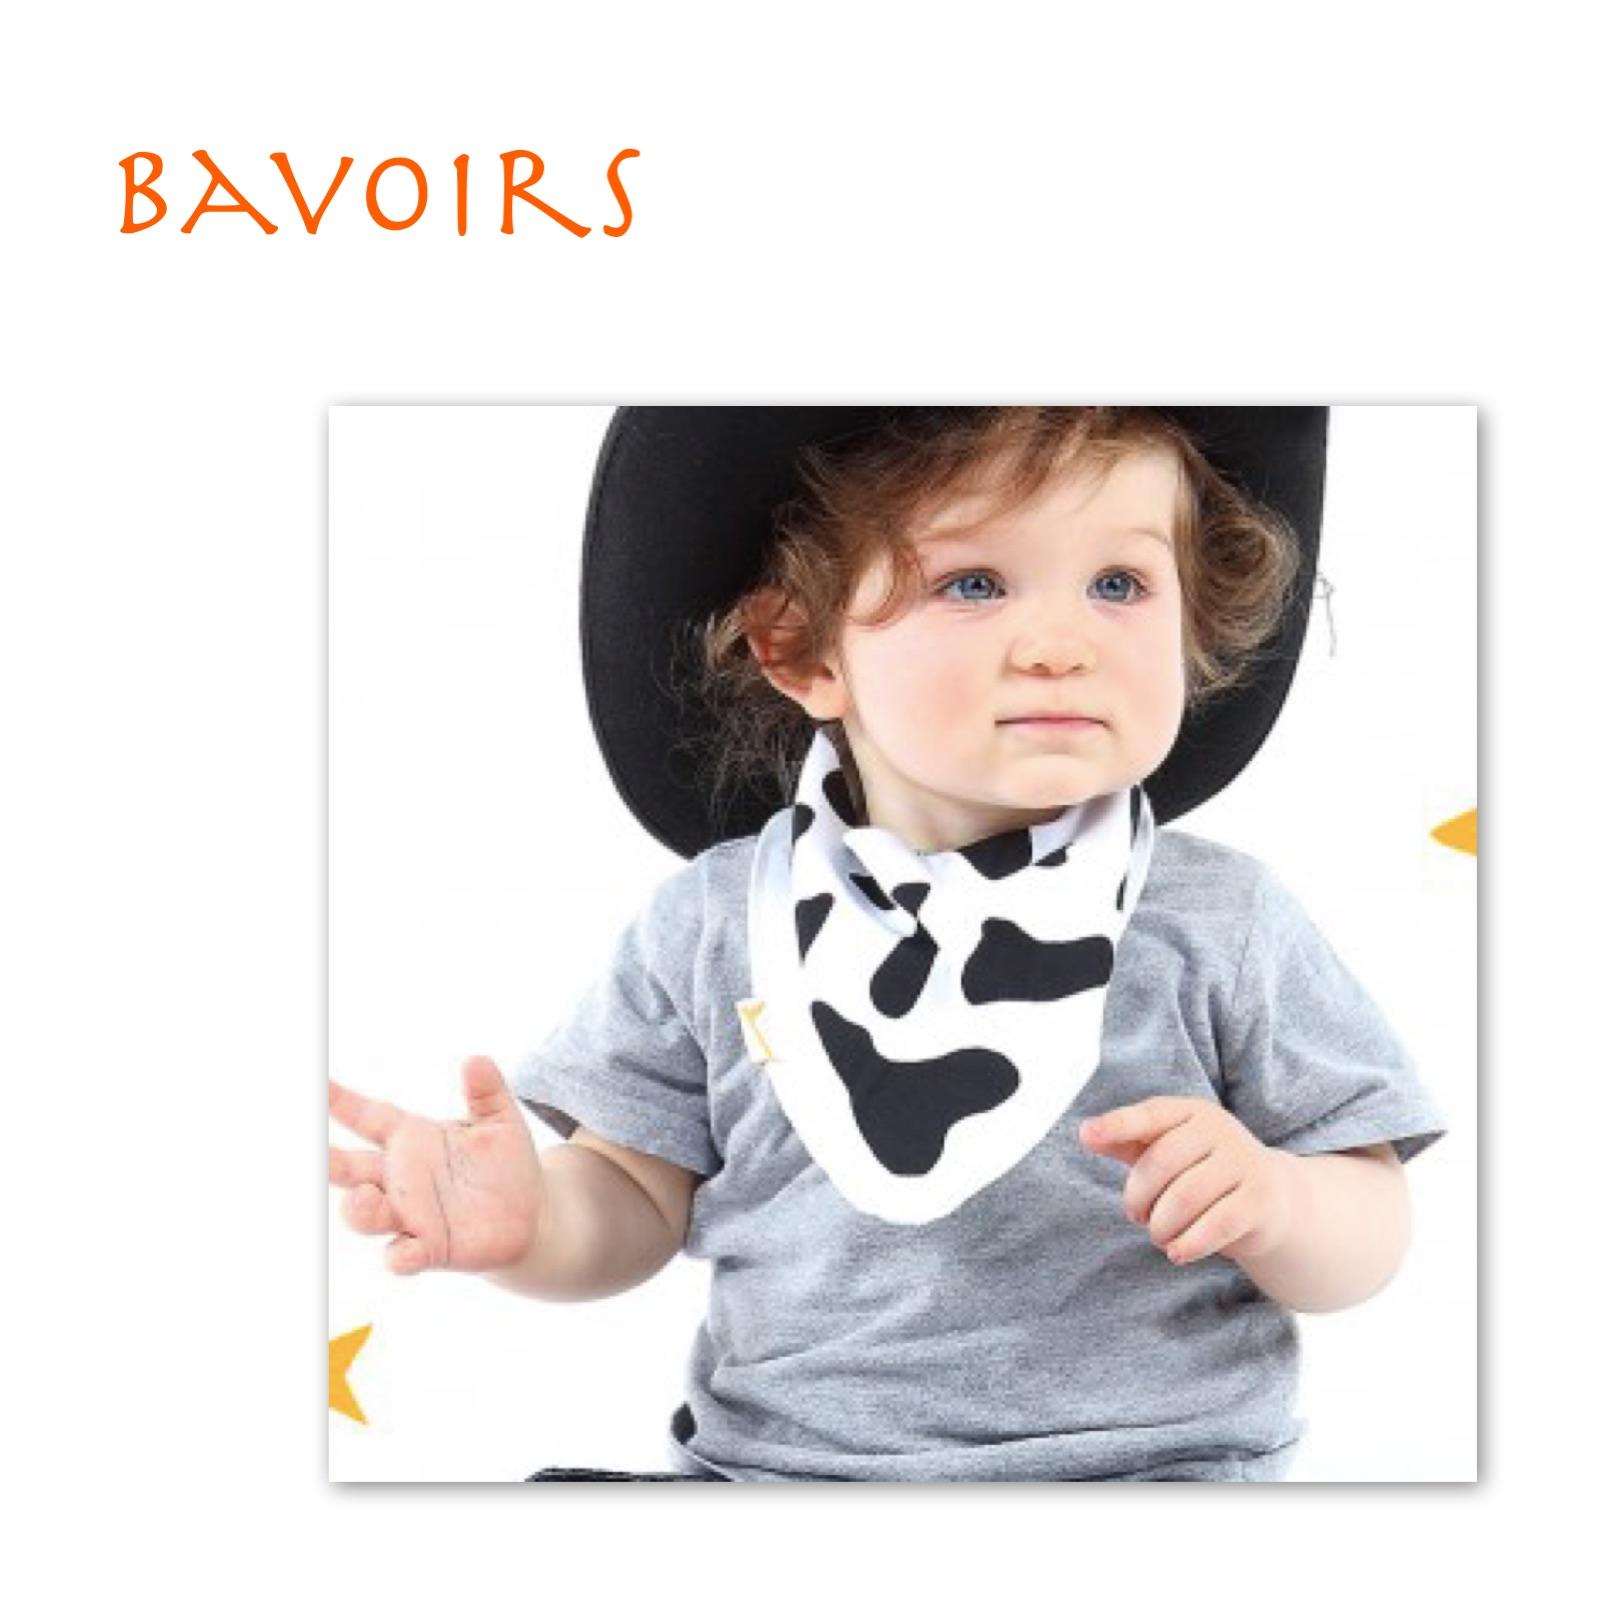 Bavoirs / Snood